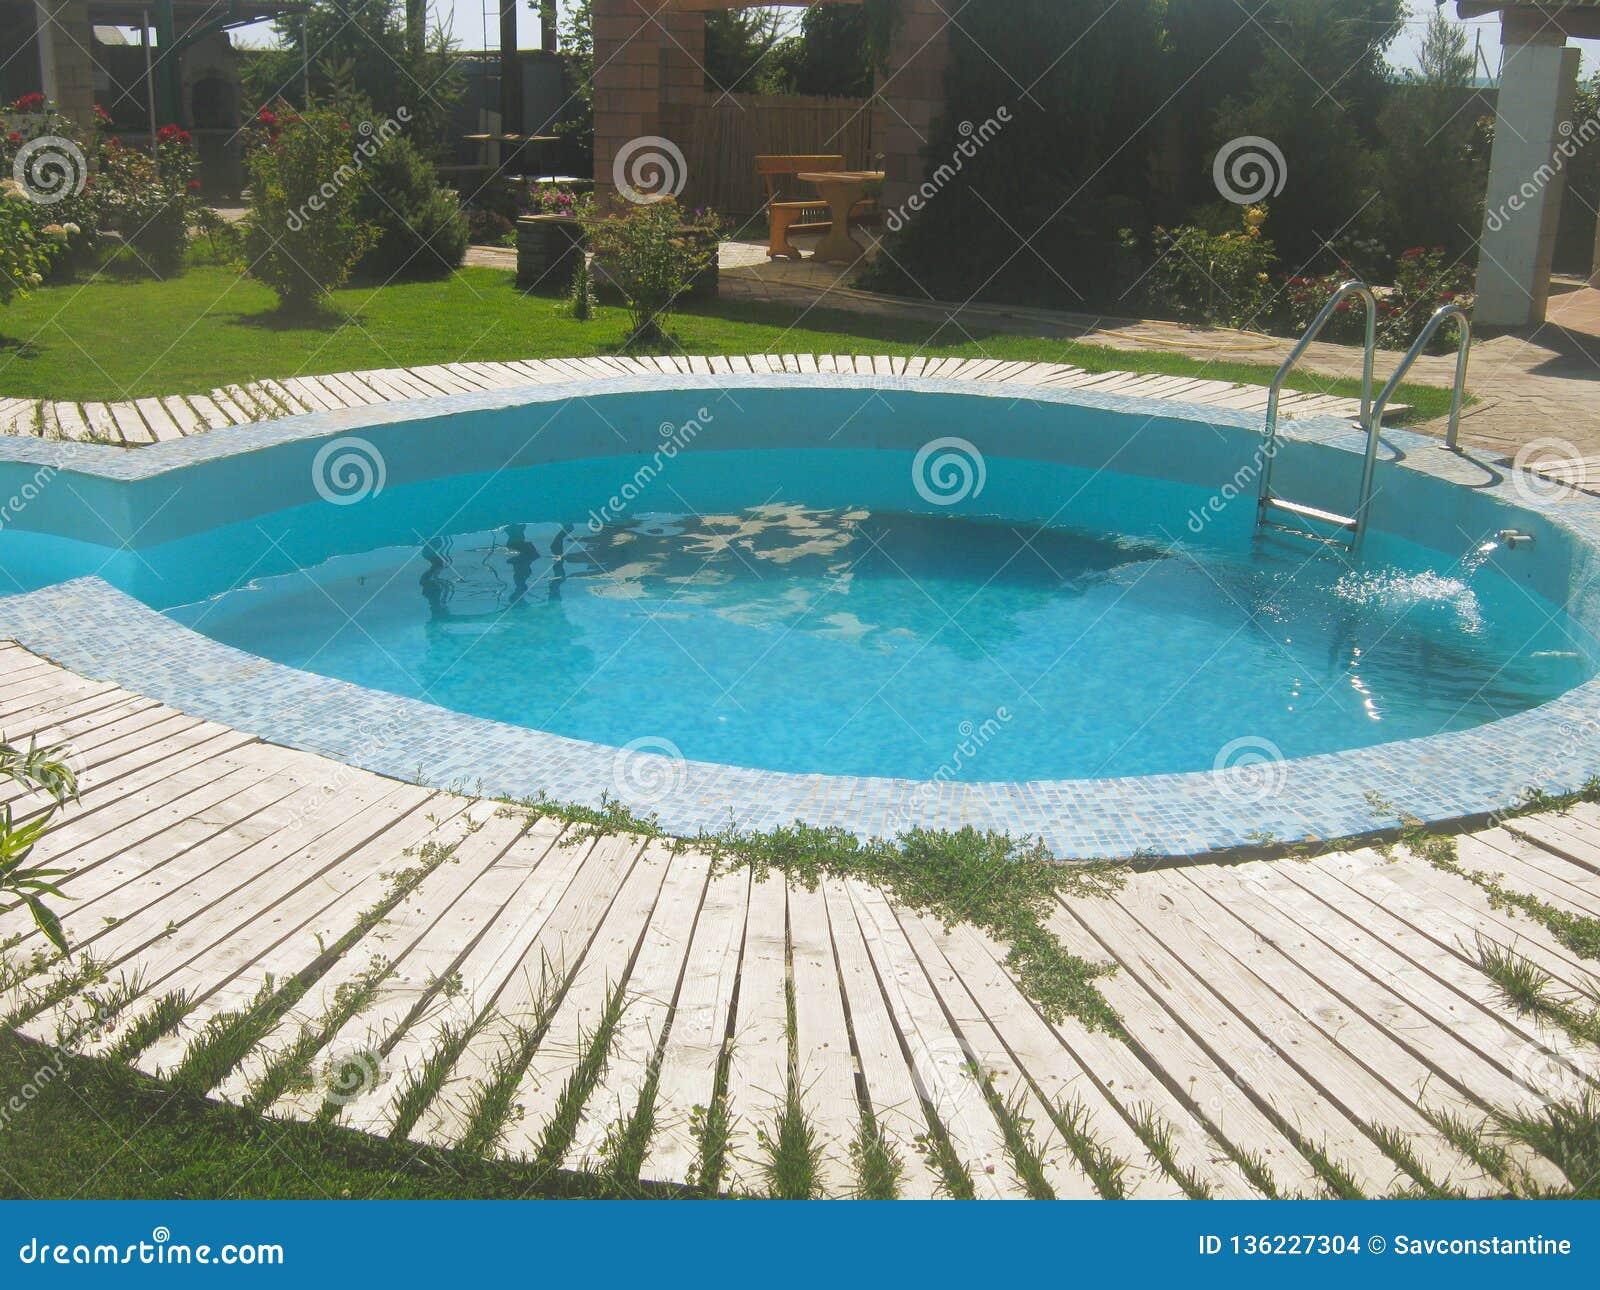 Small Pool And Summer Garden House Stock Photo Image Of Idyllic Modern 136227304